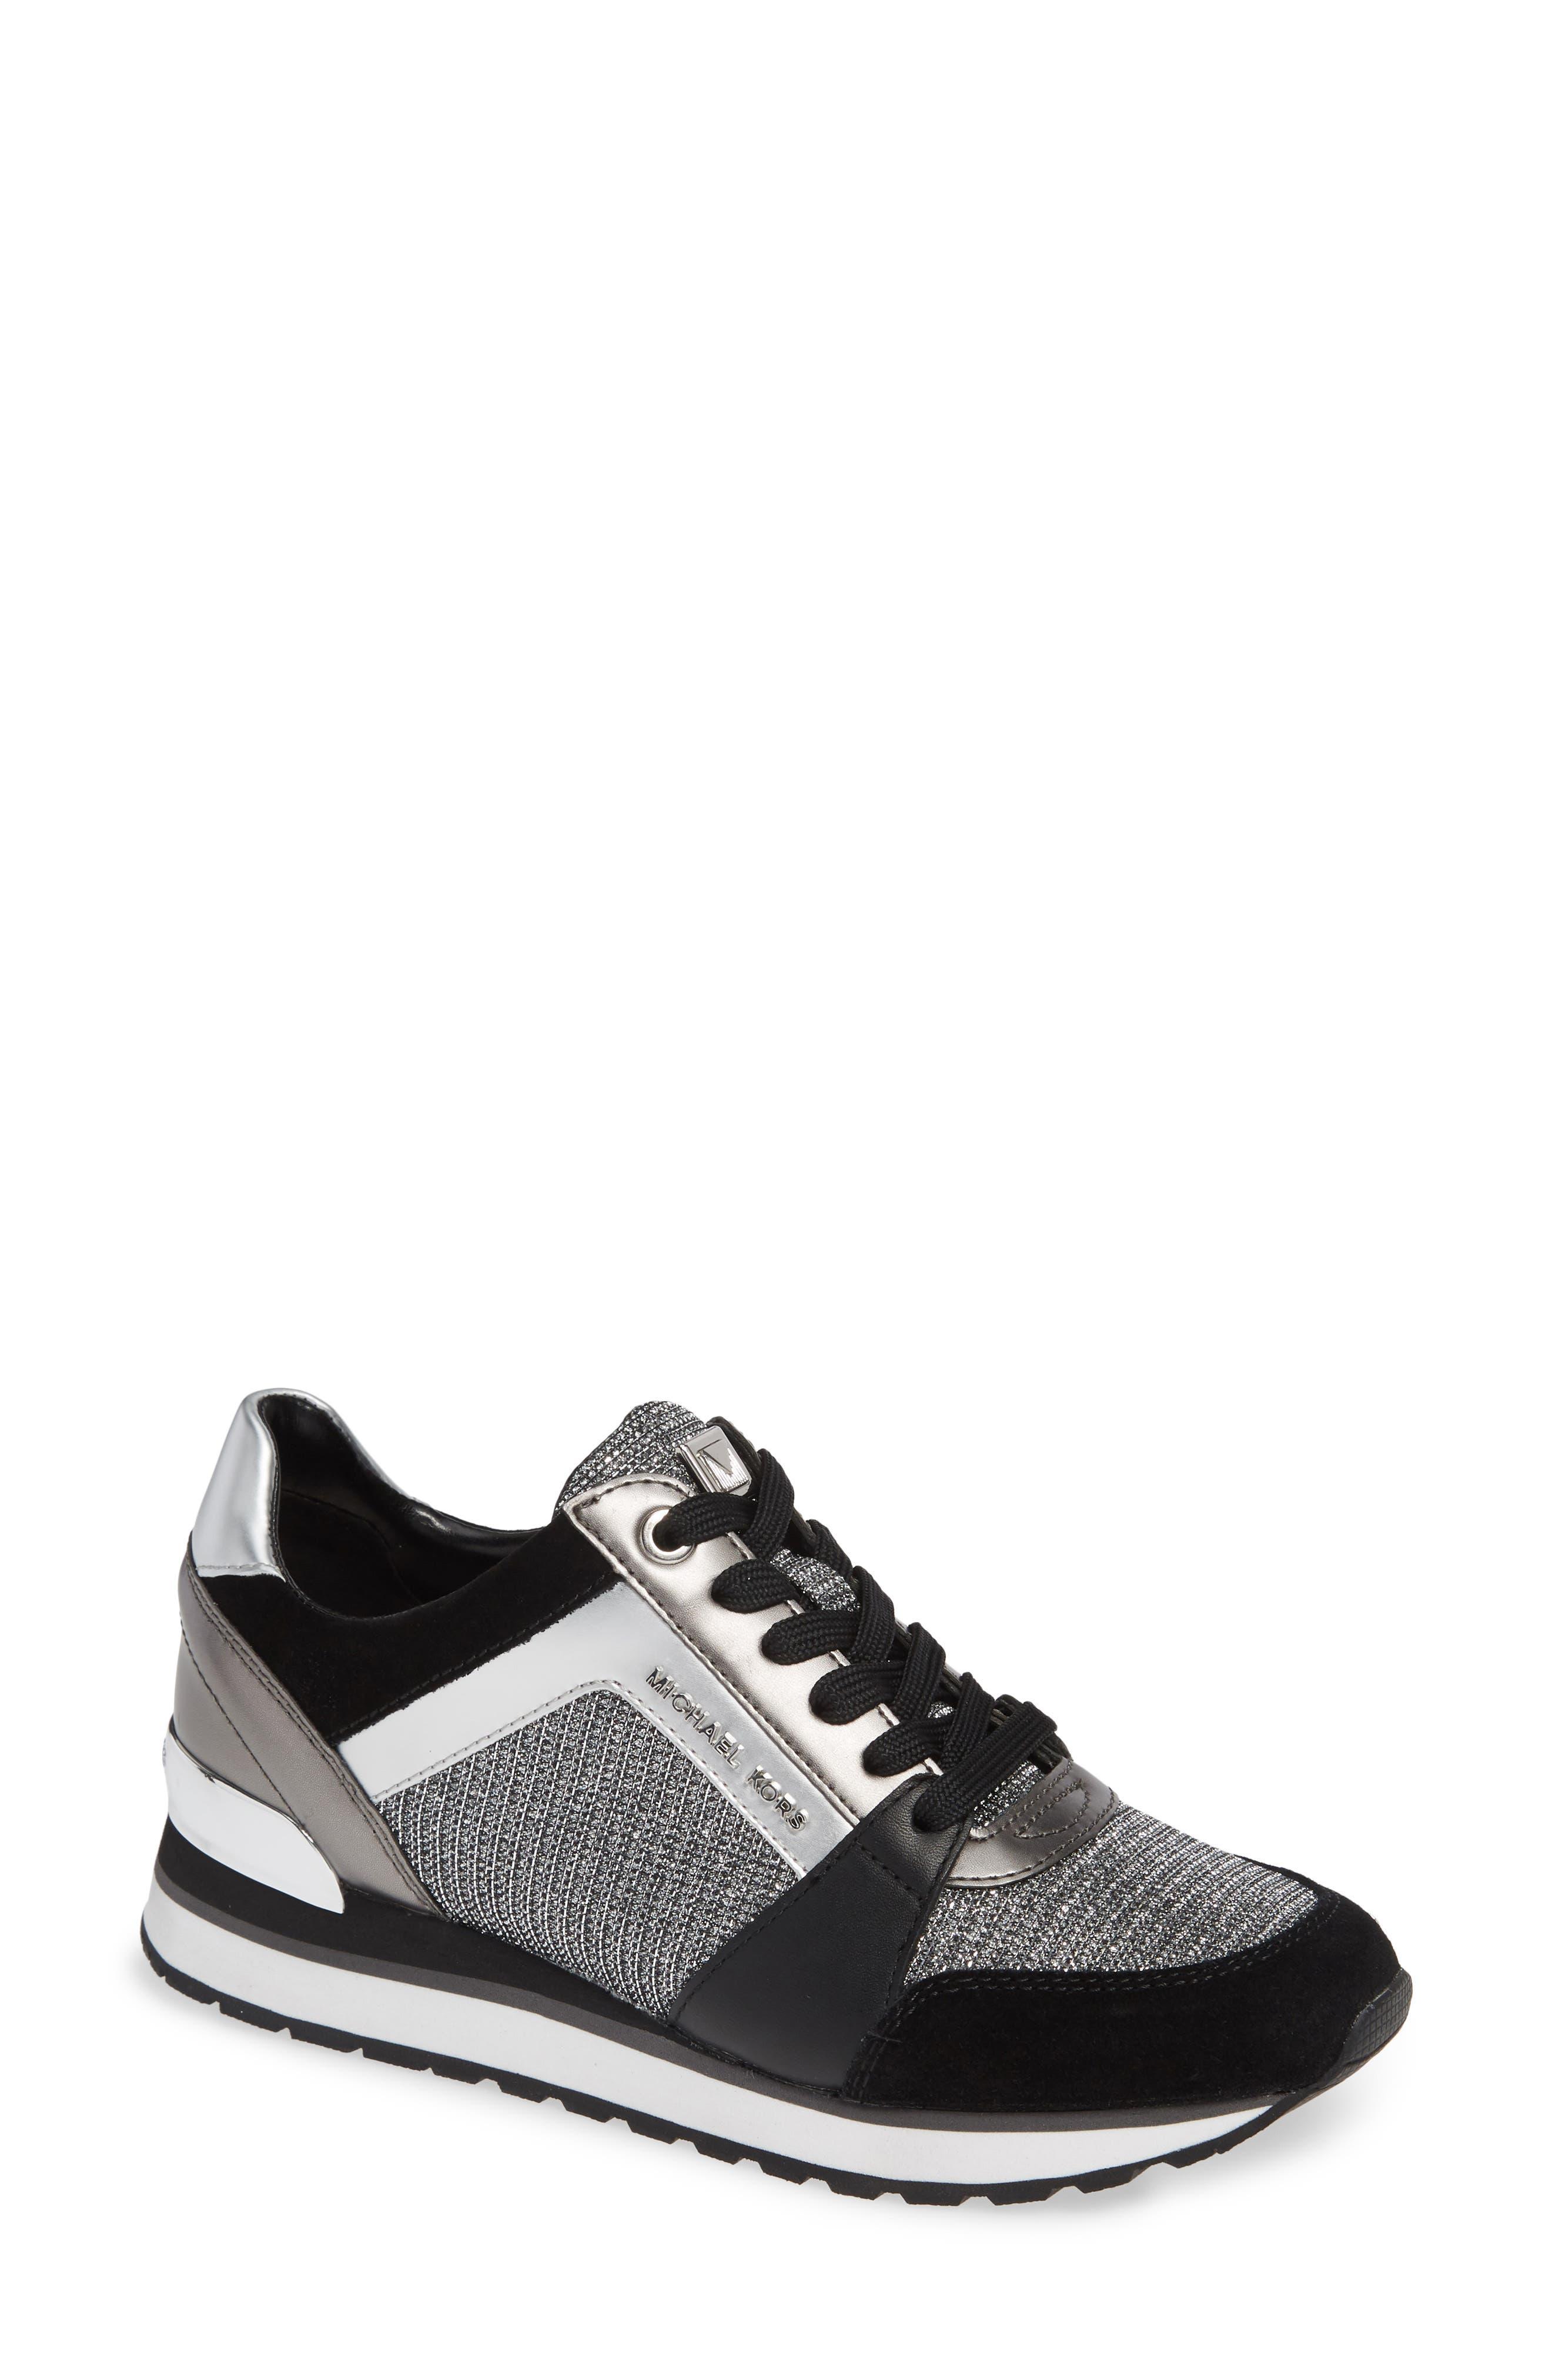 Billie Perforated Sneaker,                             Main thumbnail 1, color,                             BLACK/ SILVER